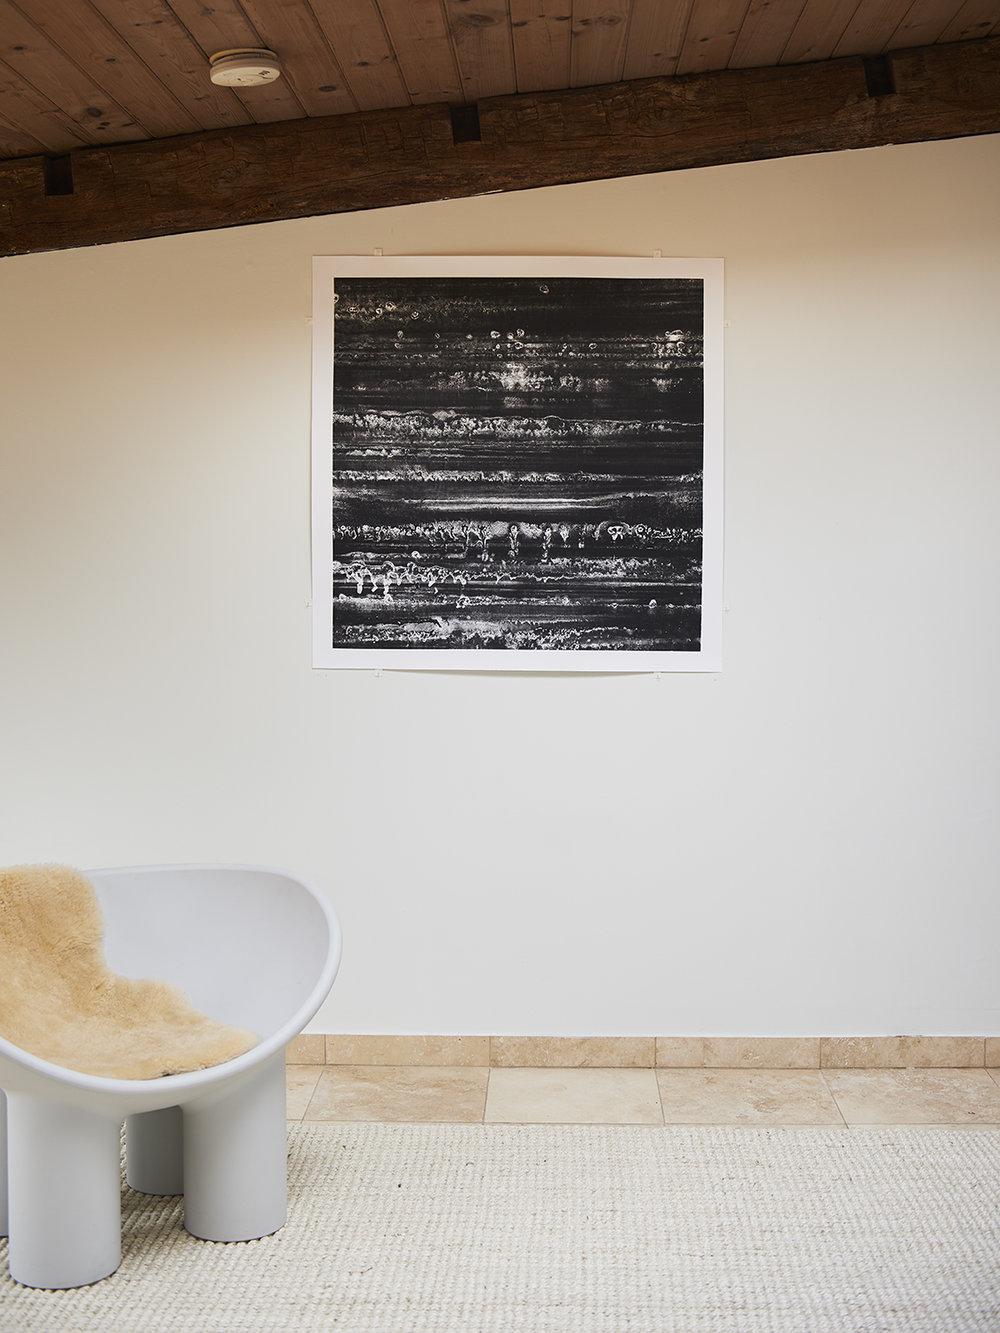 Leah Raintree, installation view, JDJ   The Ice House, 2019